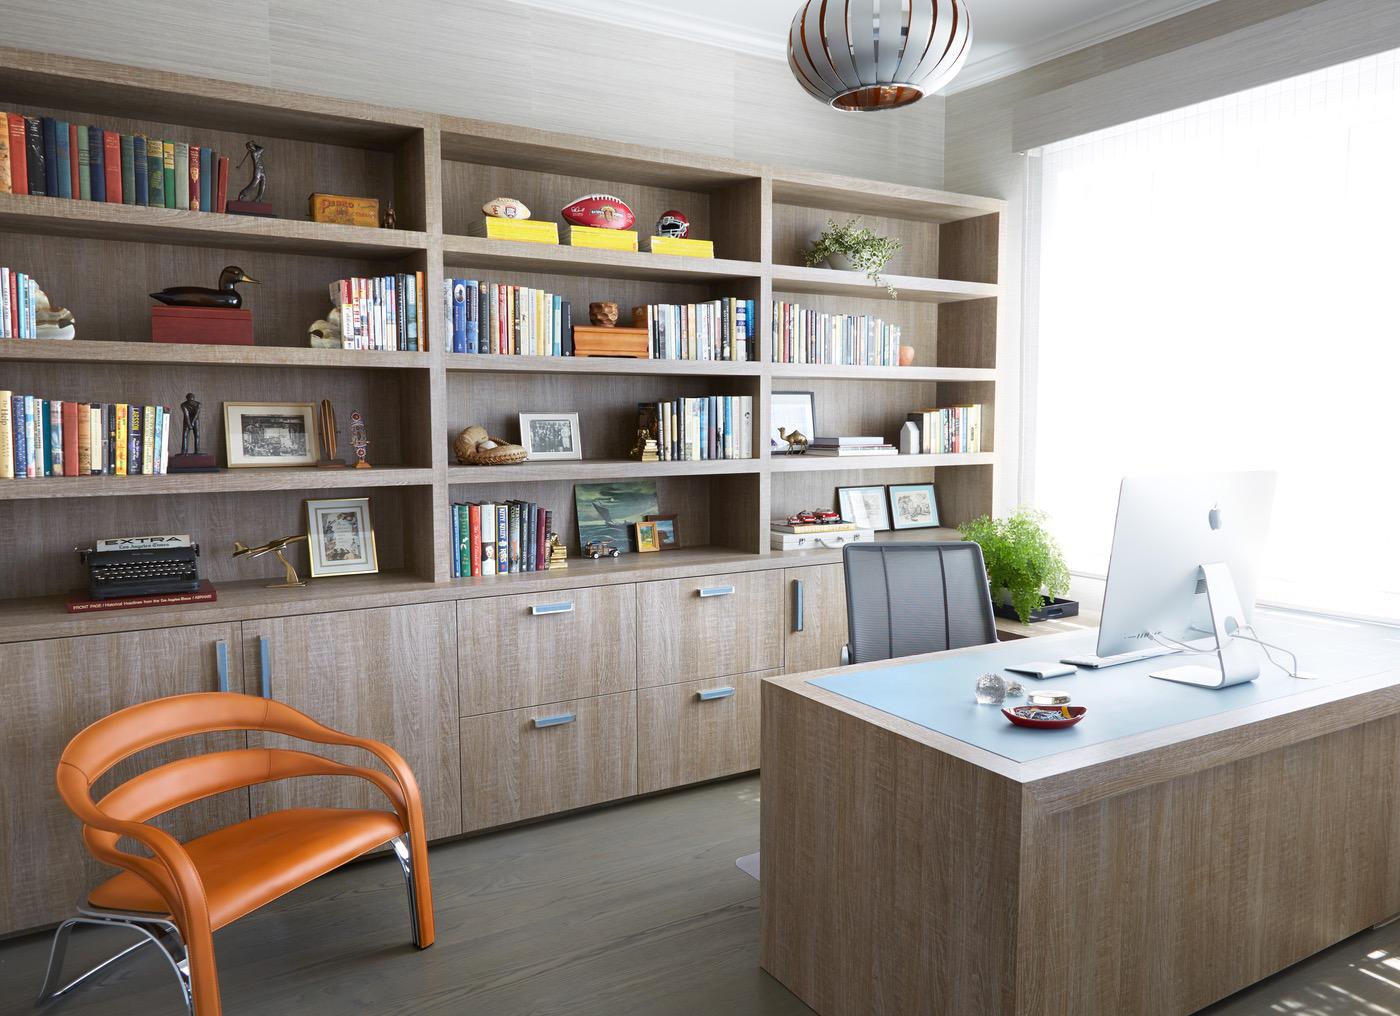 Interior design by Erin King Interiors